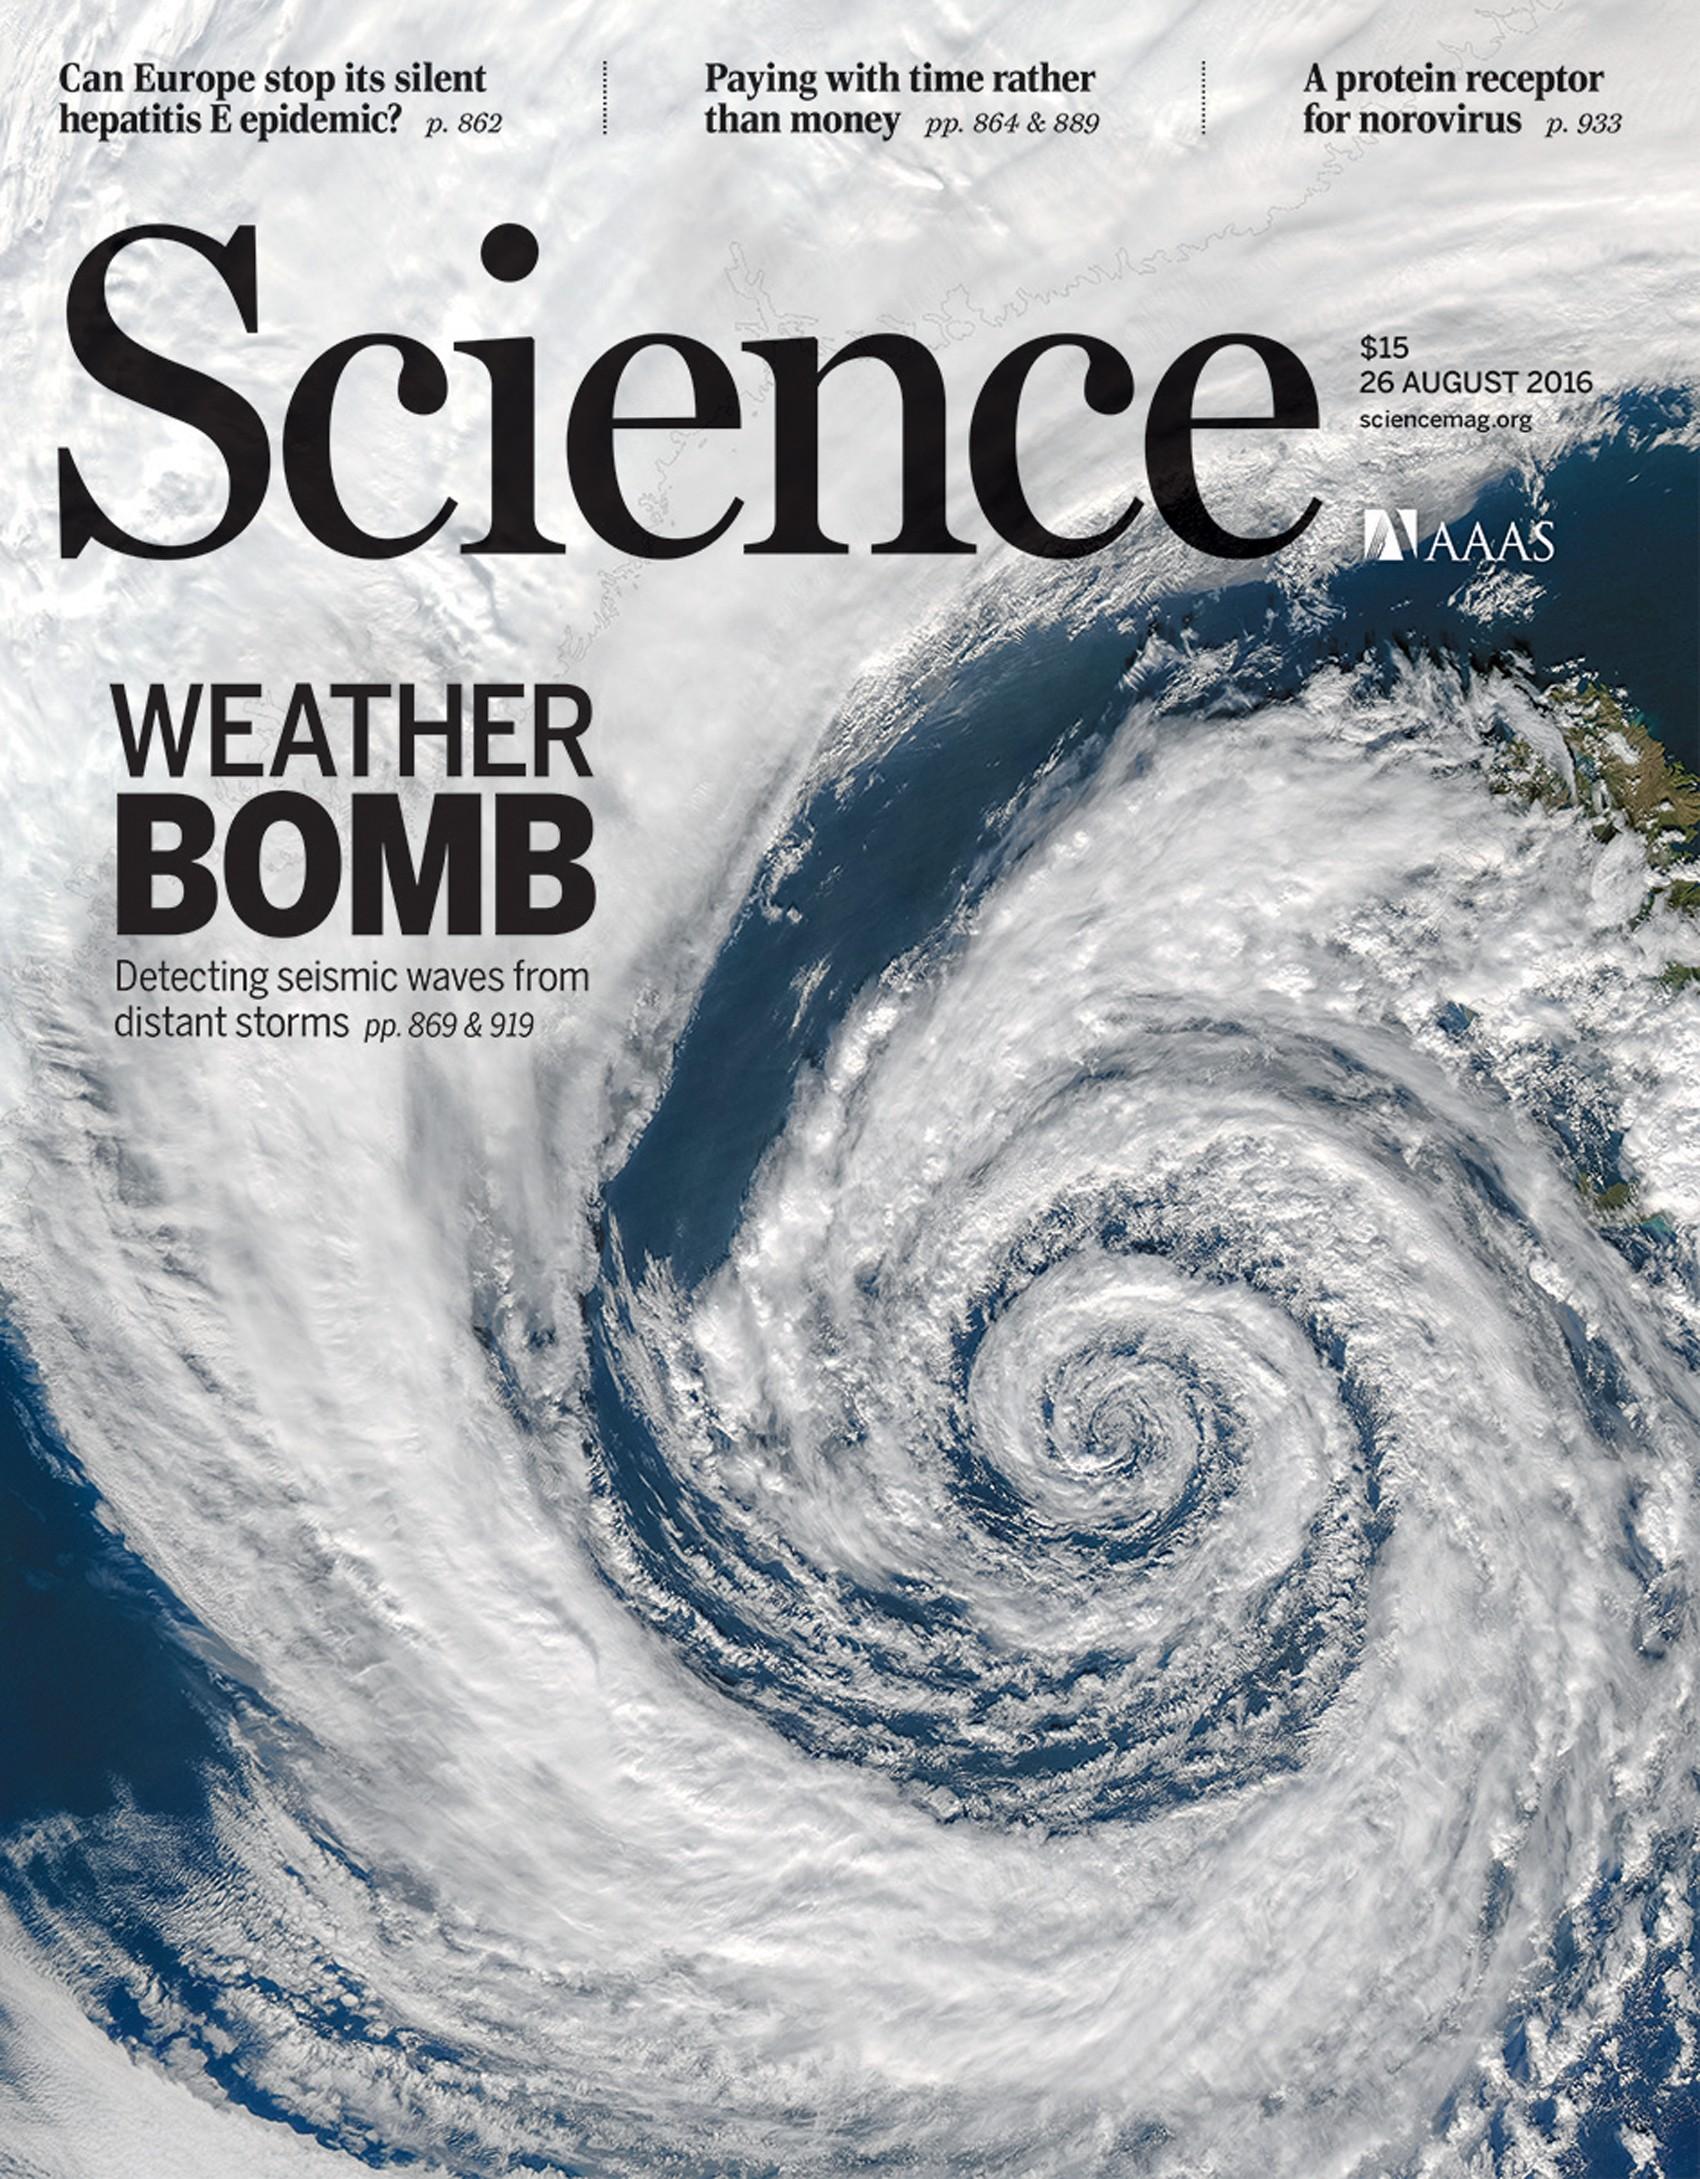 Capa da revista 'Science' desta semana destacou a pesquisa (Foto: Jacques Descloitres, MODIS Rapid Response Team, NASA/GSFC)